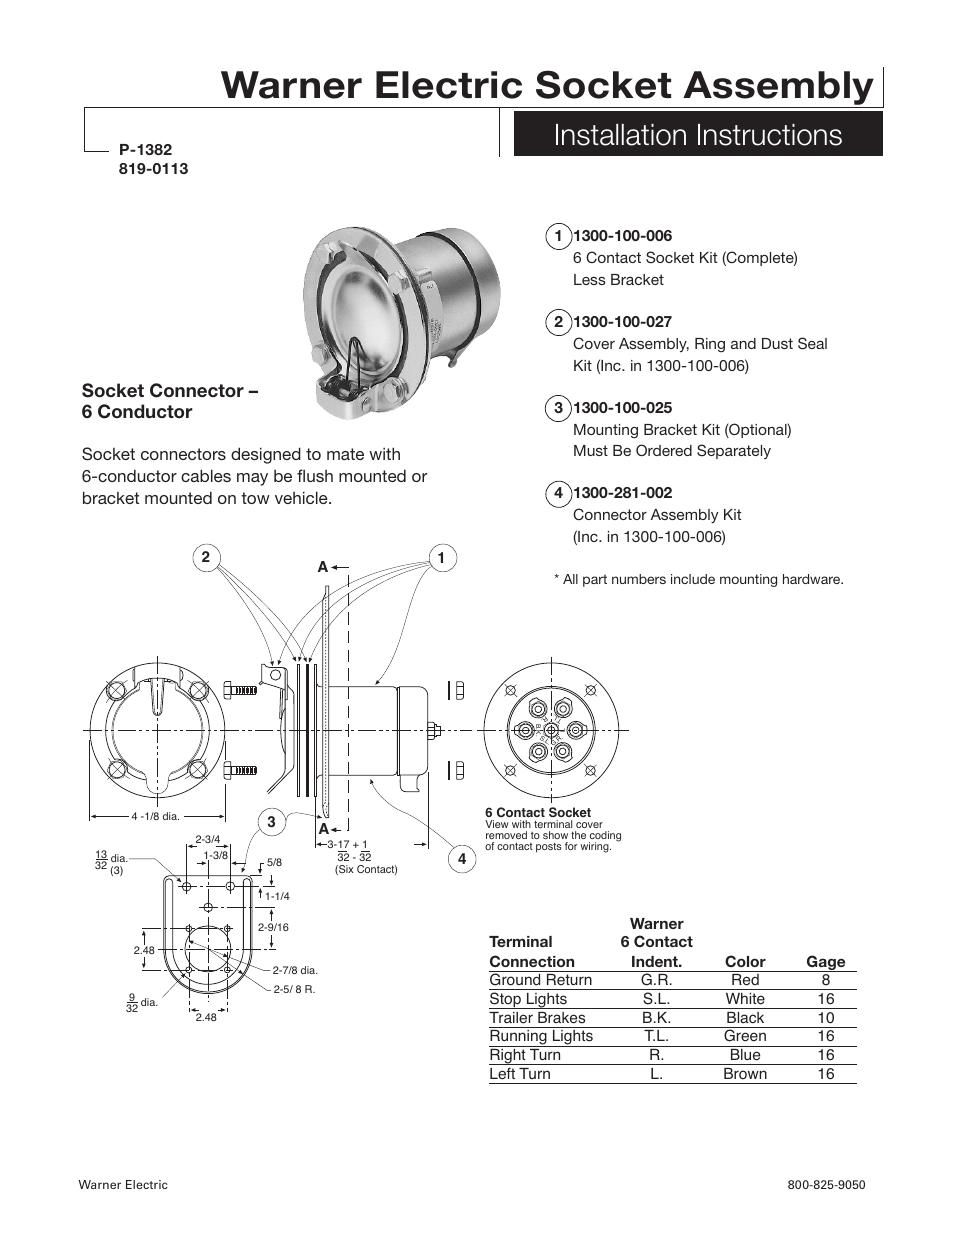 medium resolution of warner electric electric socket assembly installation user manualwarner electric electric socket assembly installation user manual 2